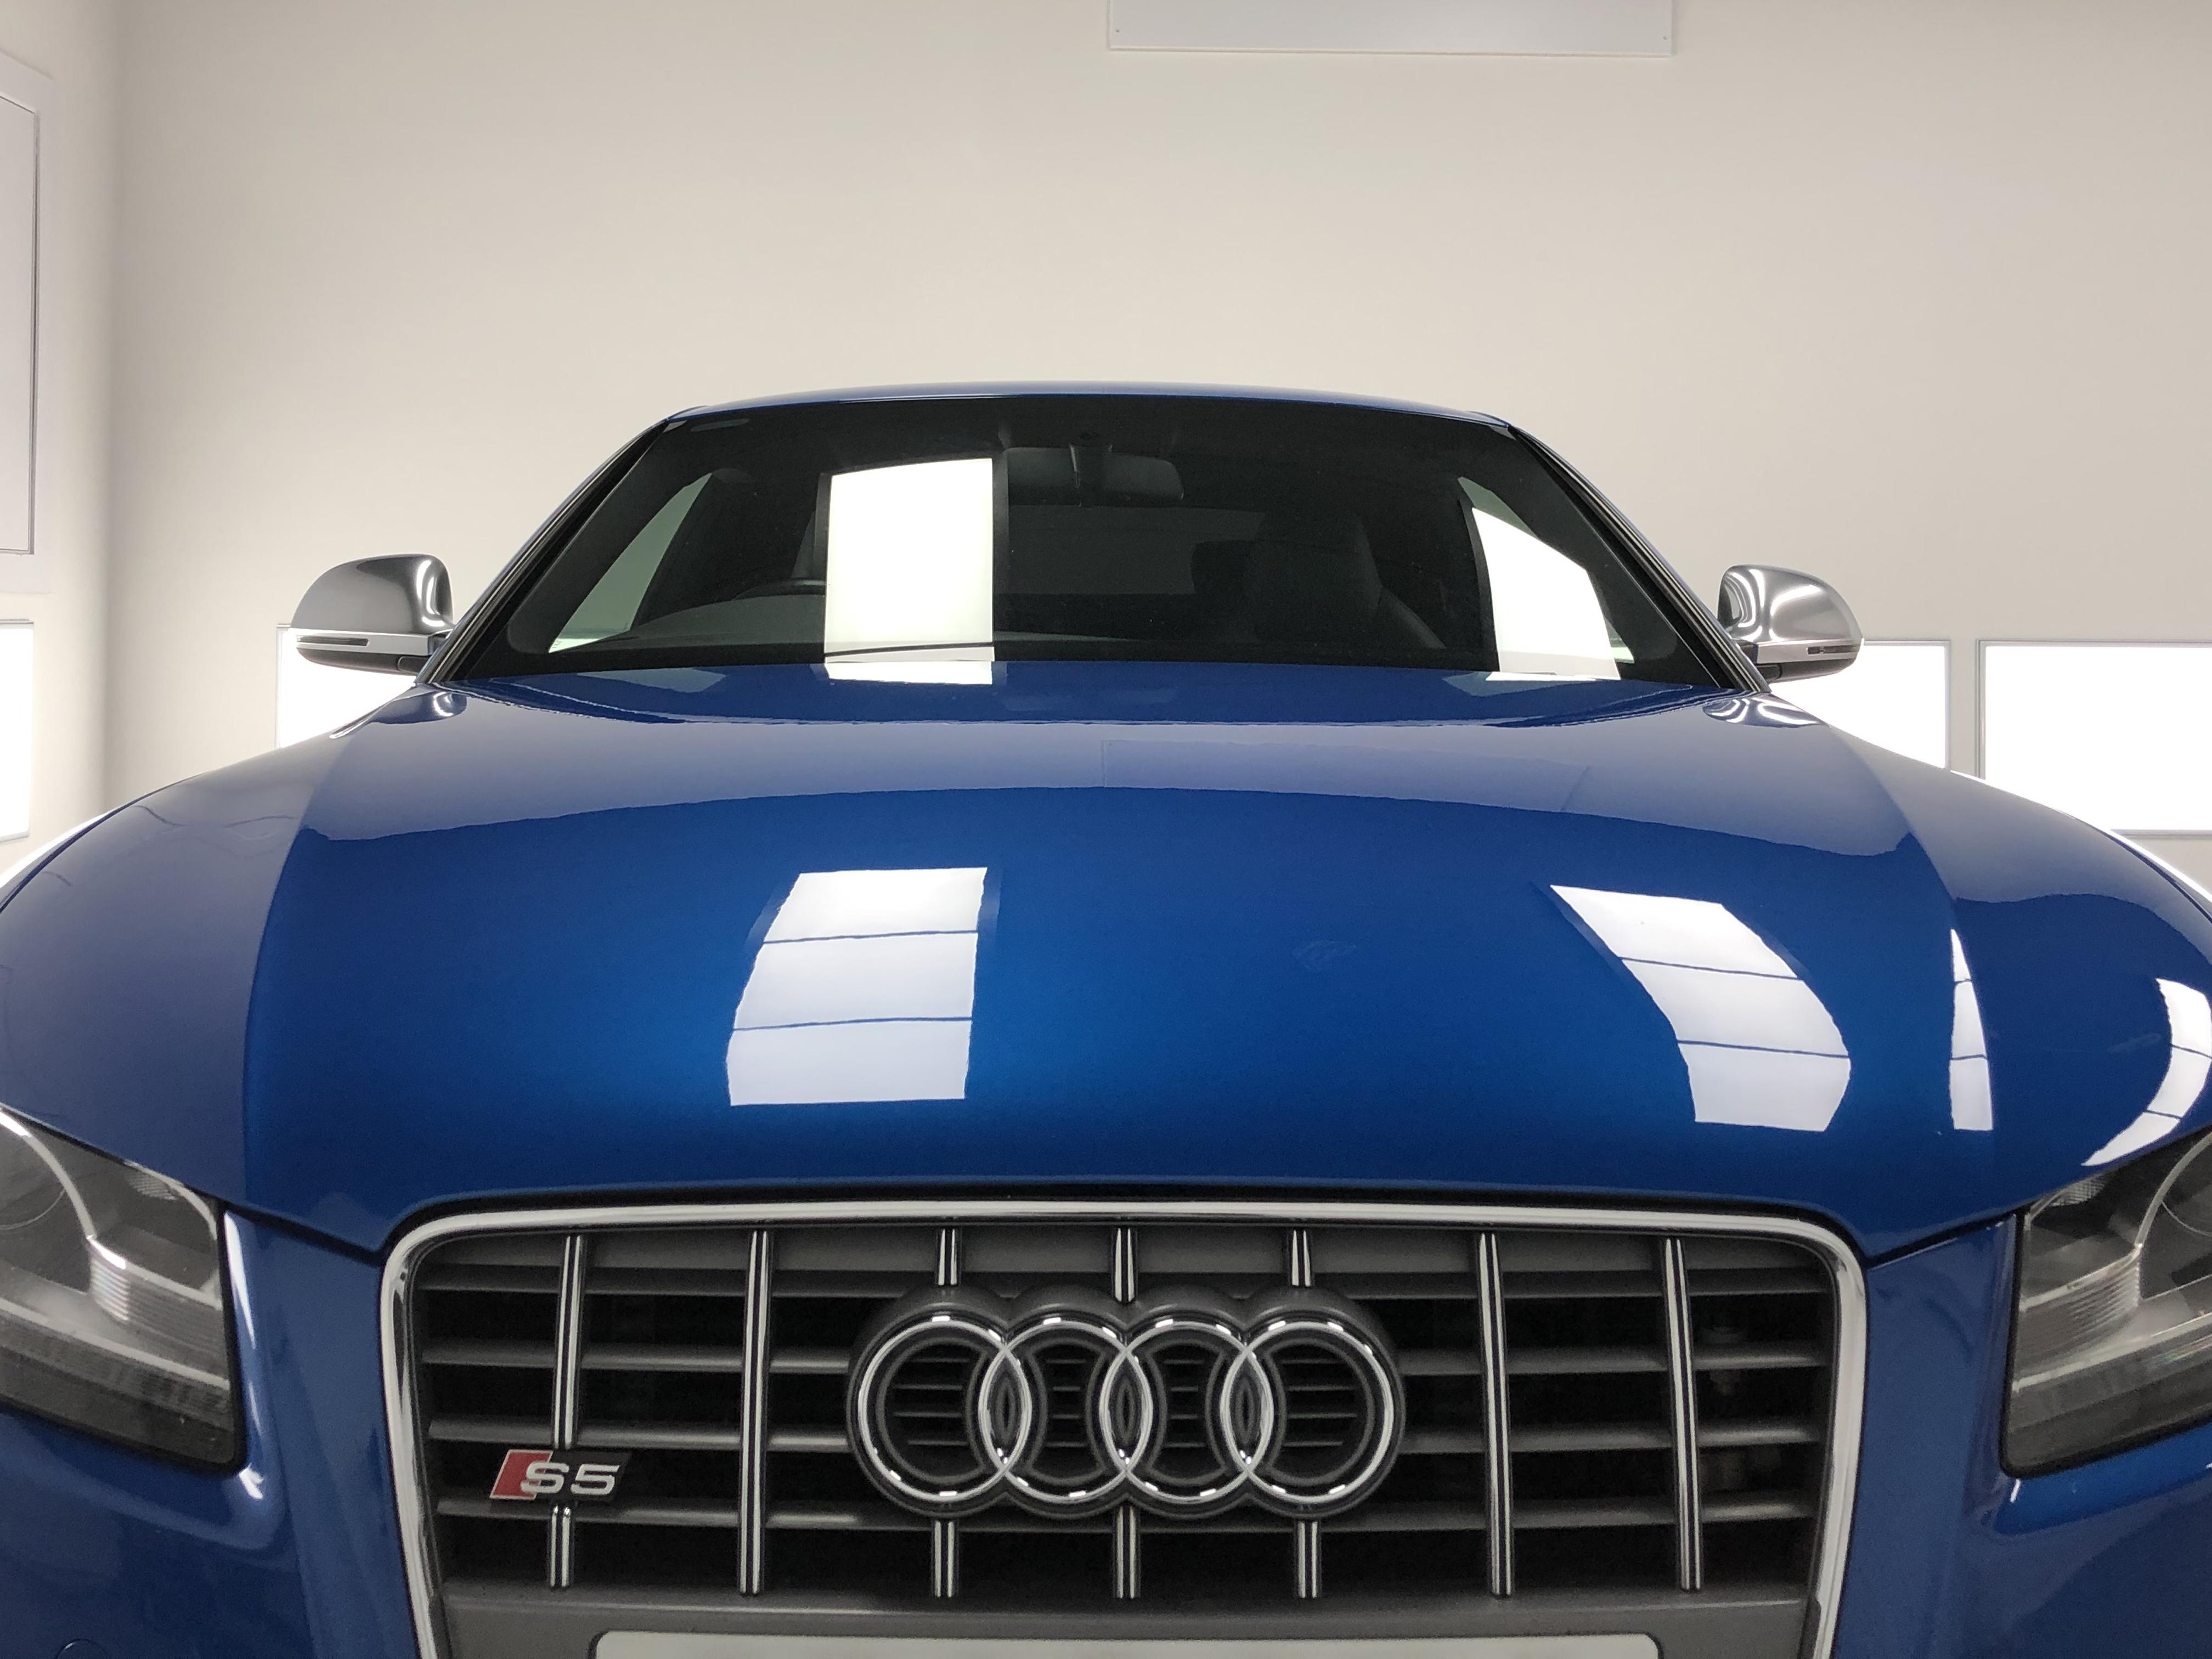 Audi S5 detailing